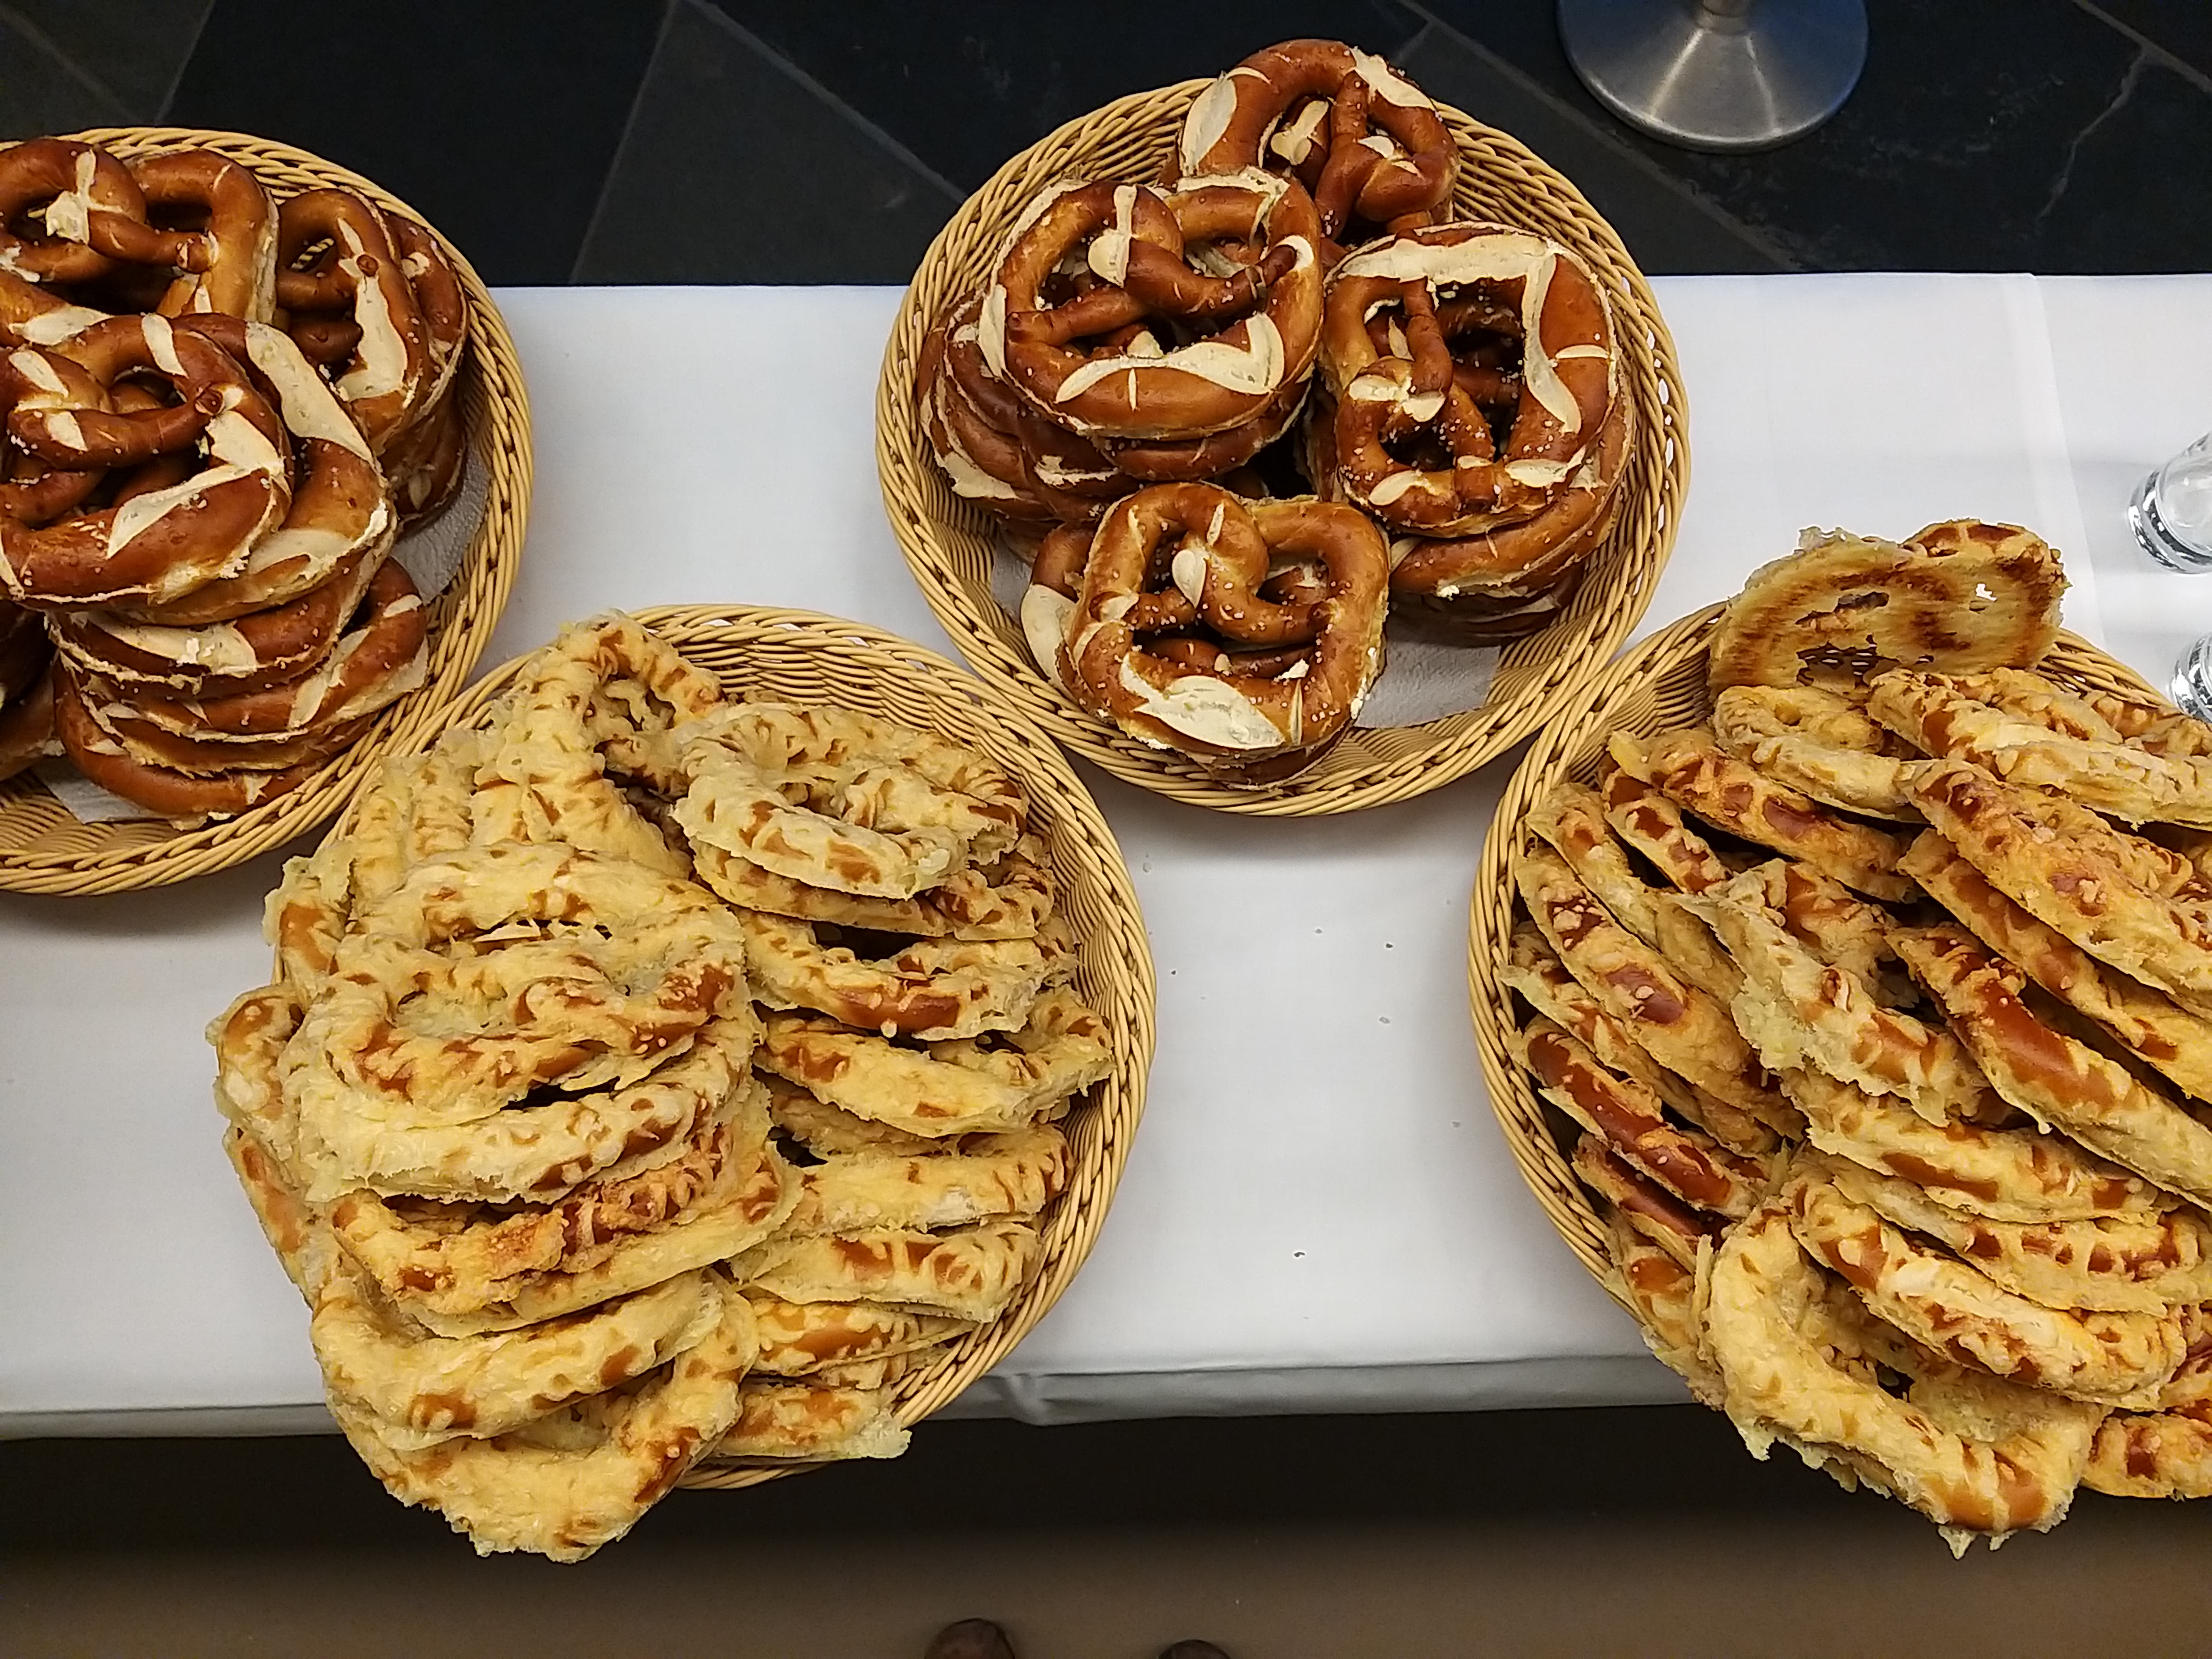 BrezelBar-Lieferservice und Catering